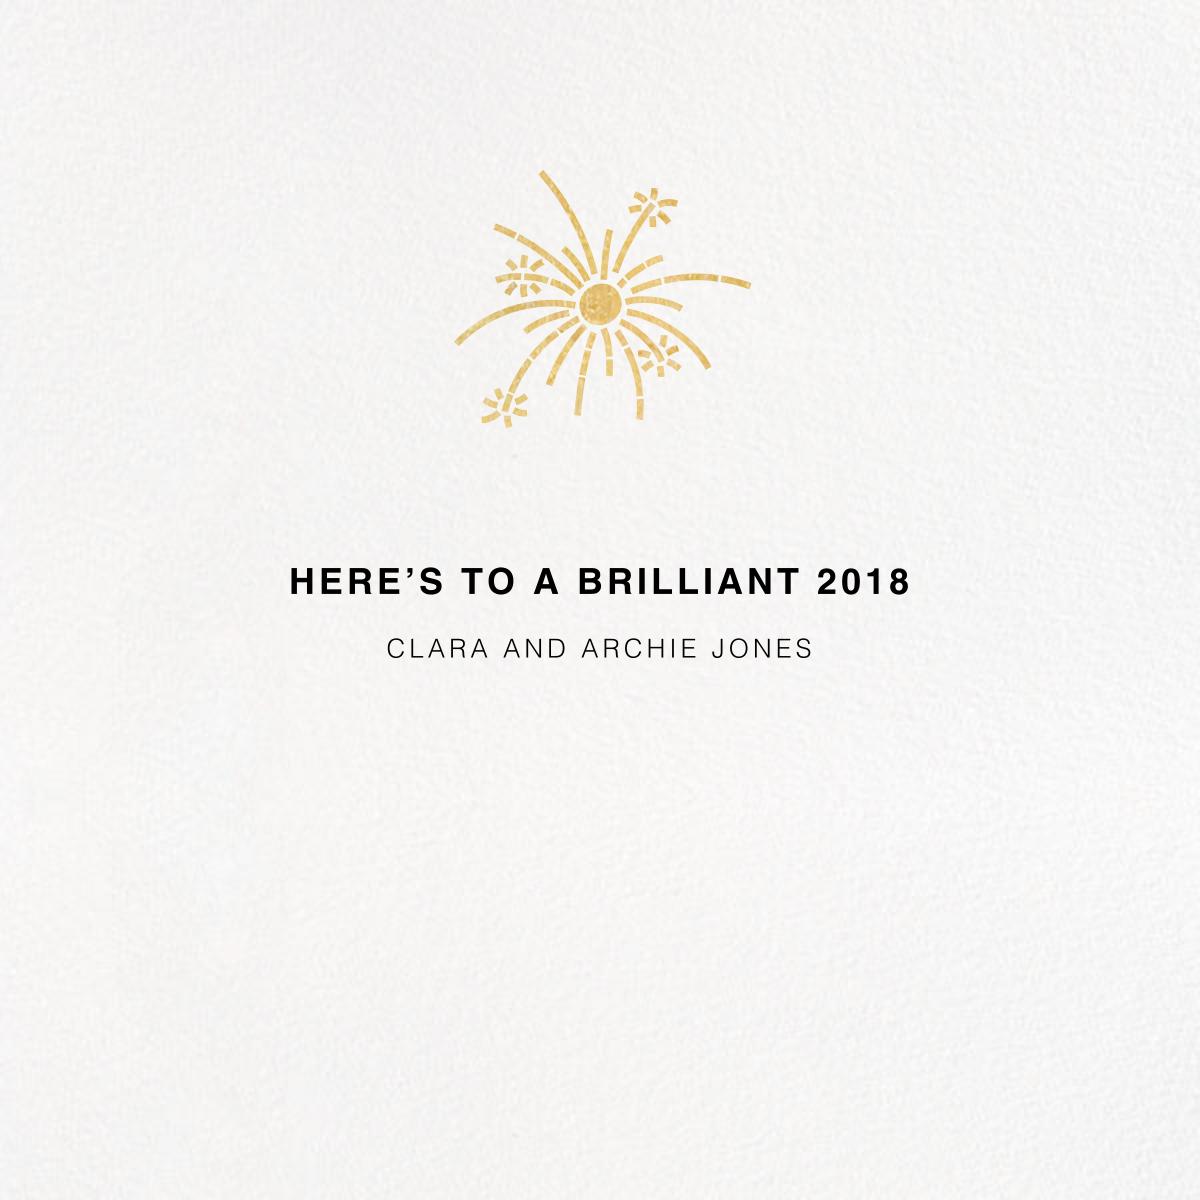 Jubilant Jumble - New Years - Paperless Post - New Year - card back